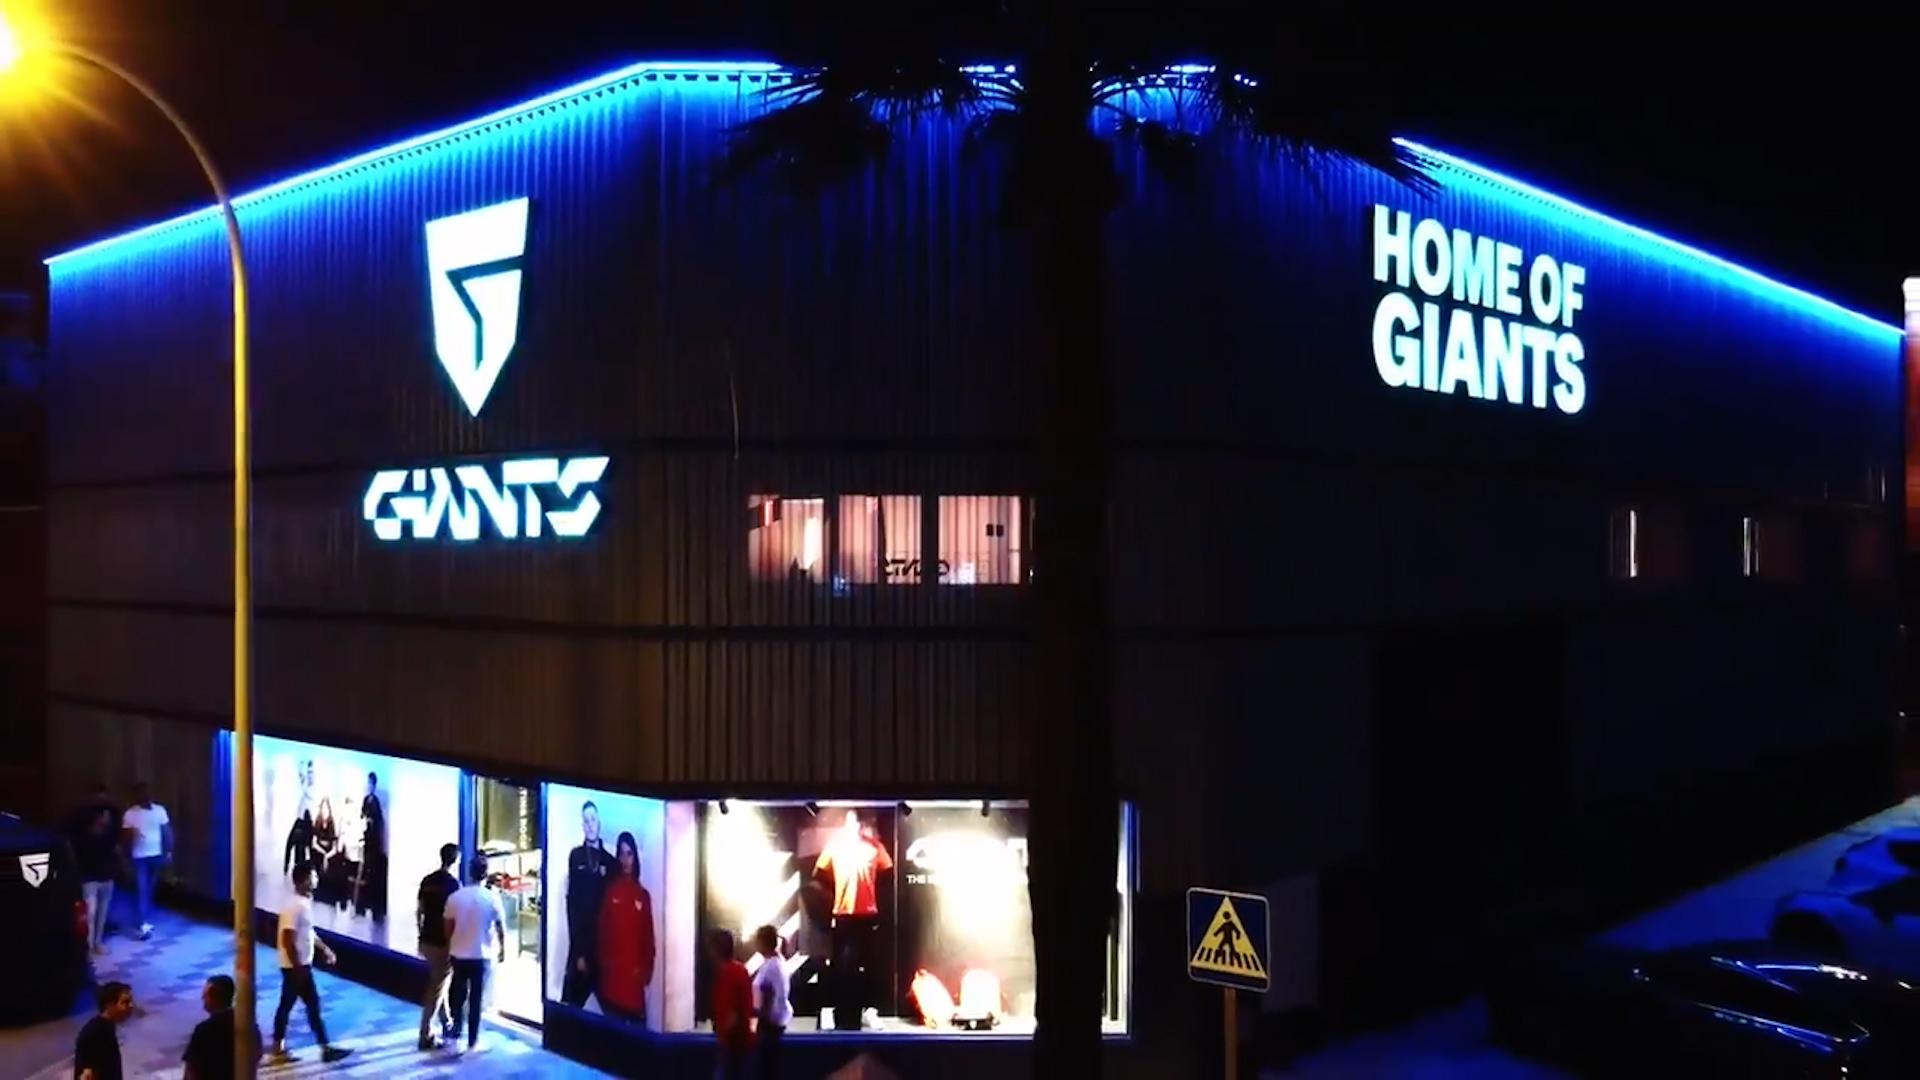 Así es 'Home of Giants', la espectacular sede de Vodafone Giants en Málaga